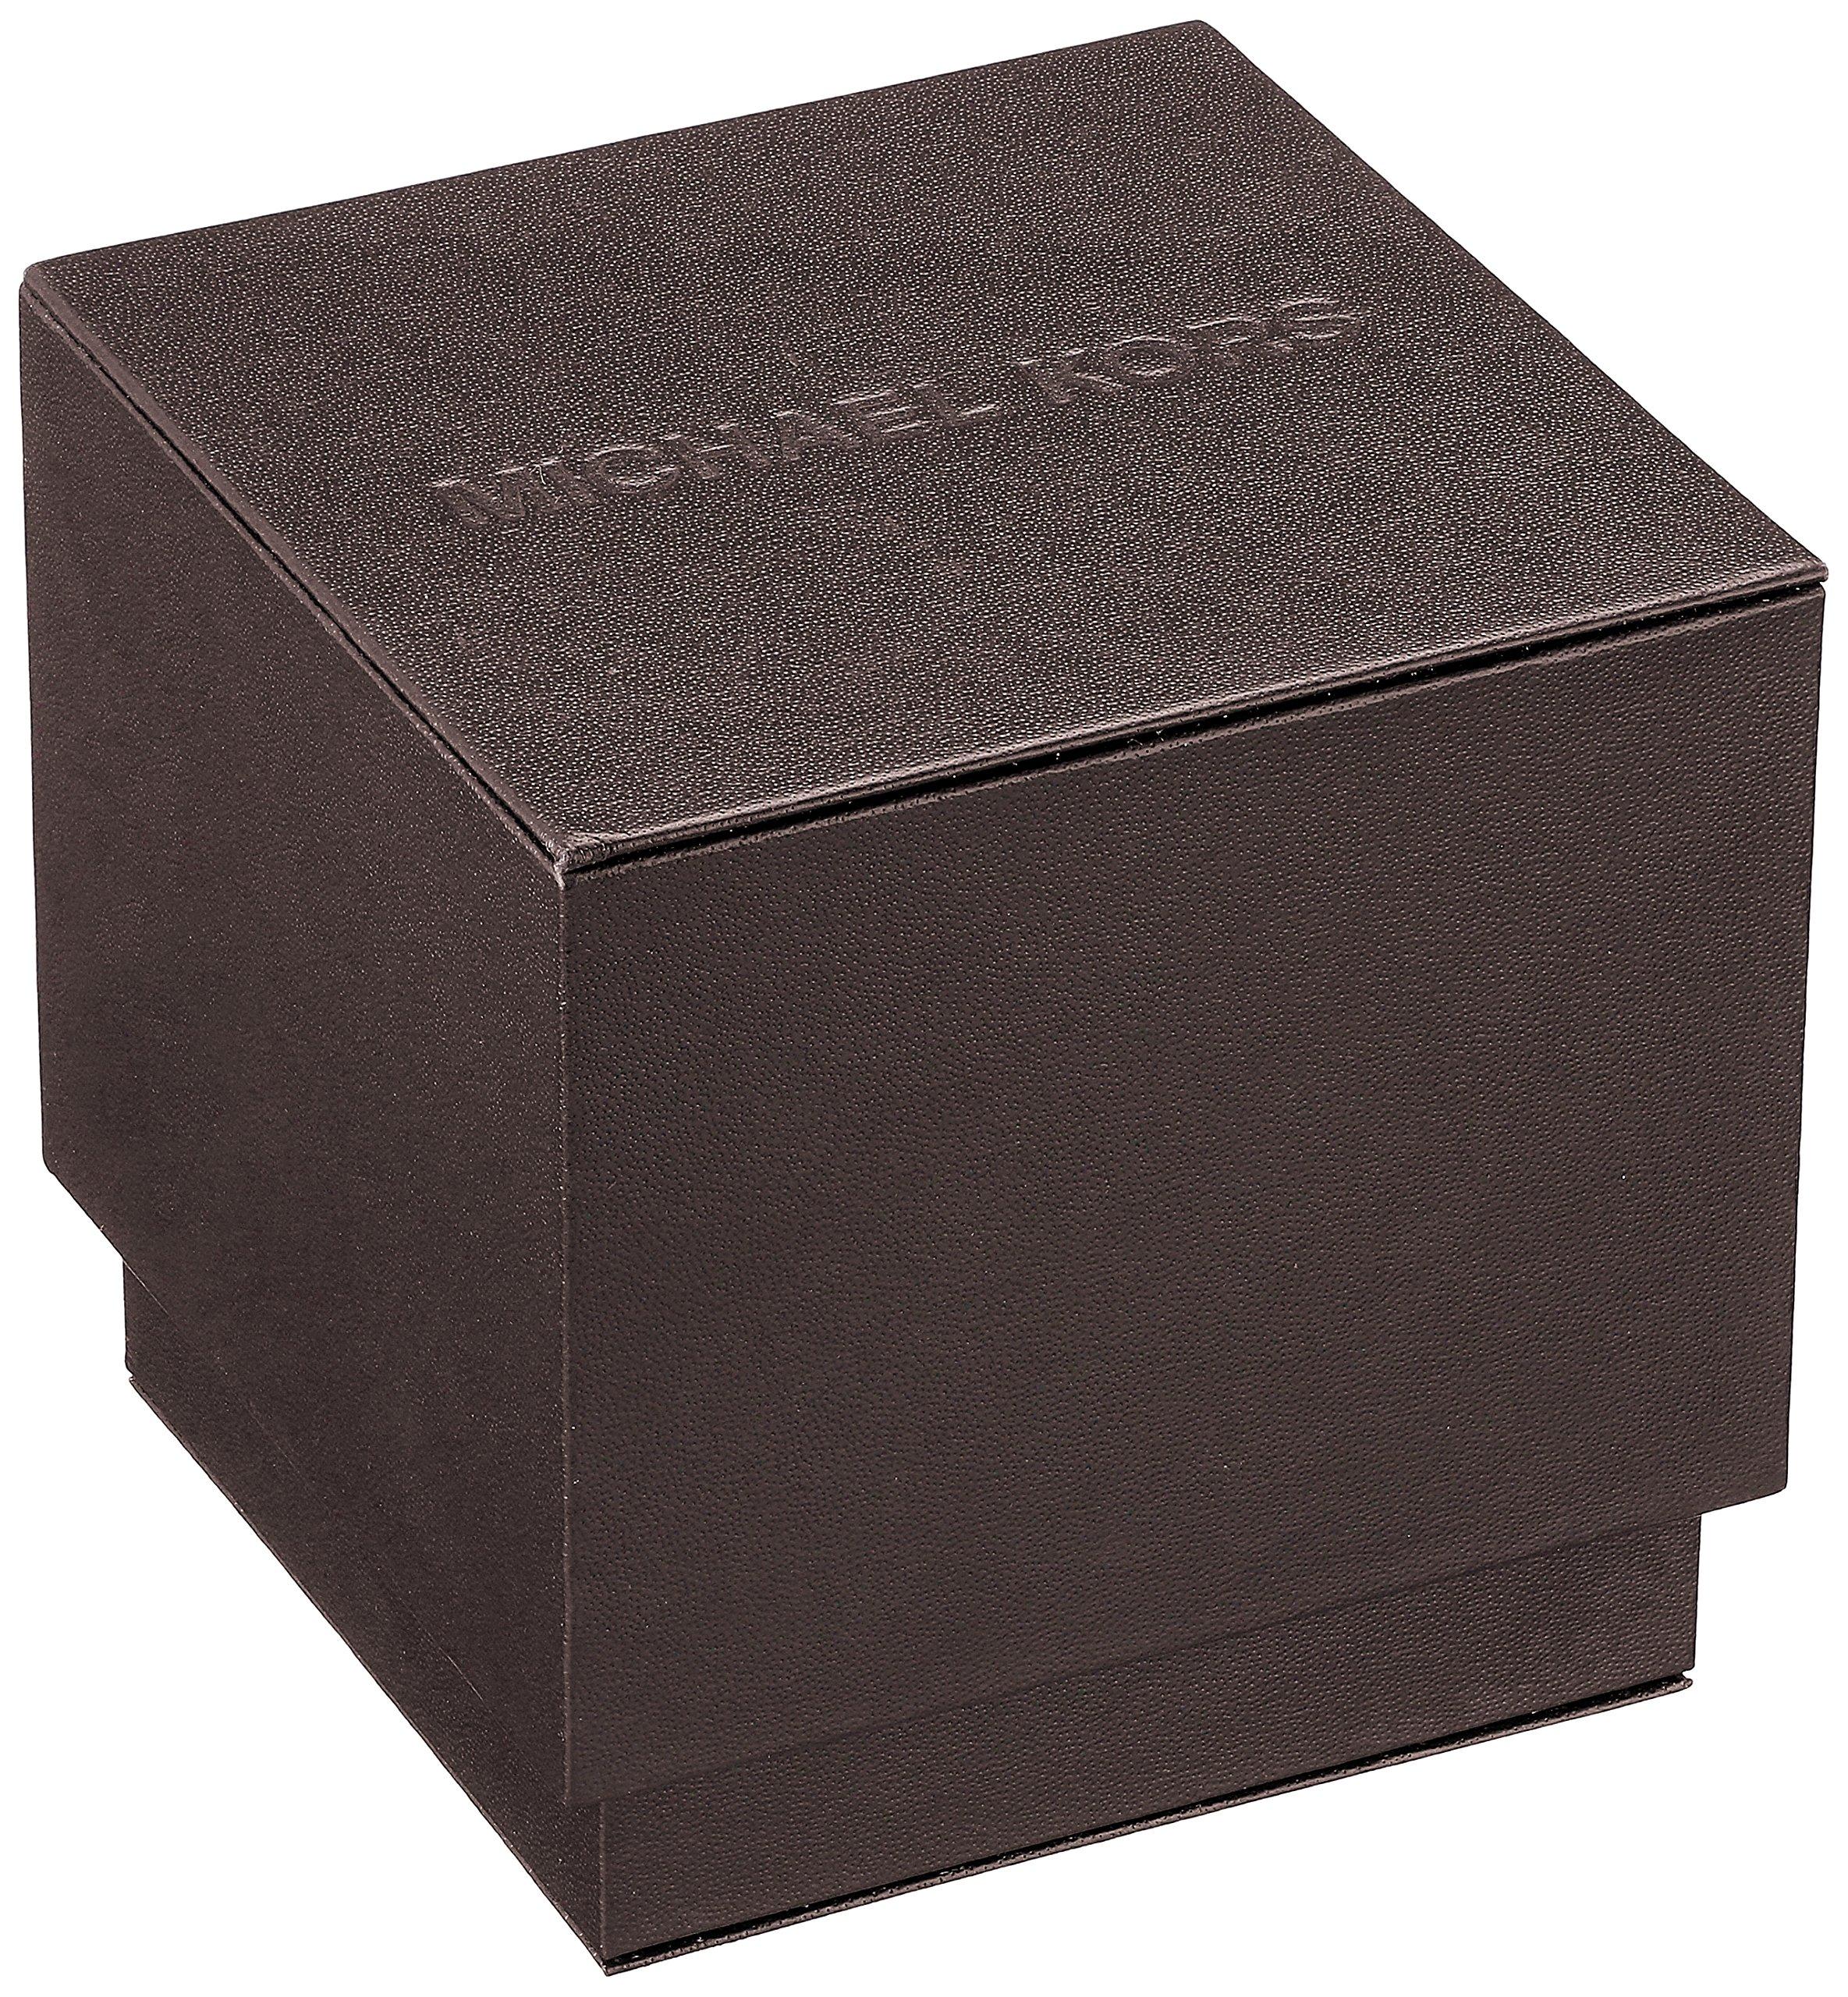 Michael Kors Women's Parker Gold-Tone Watch MK6313 by Michael Kors (Image #3)